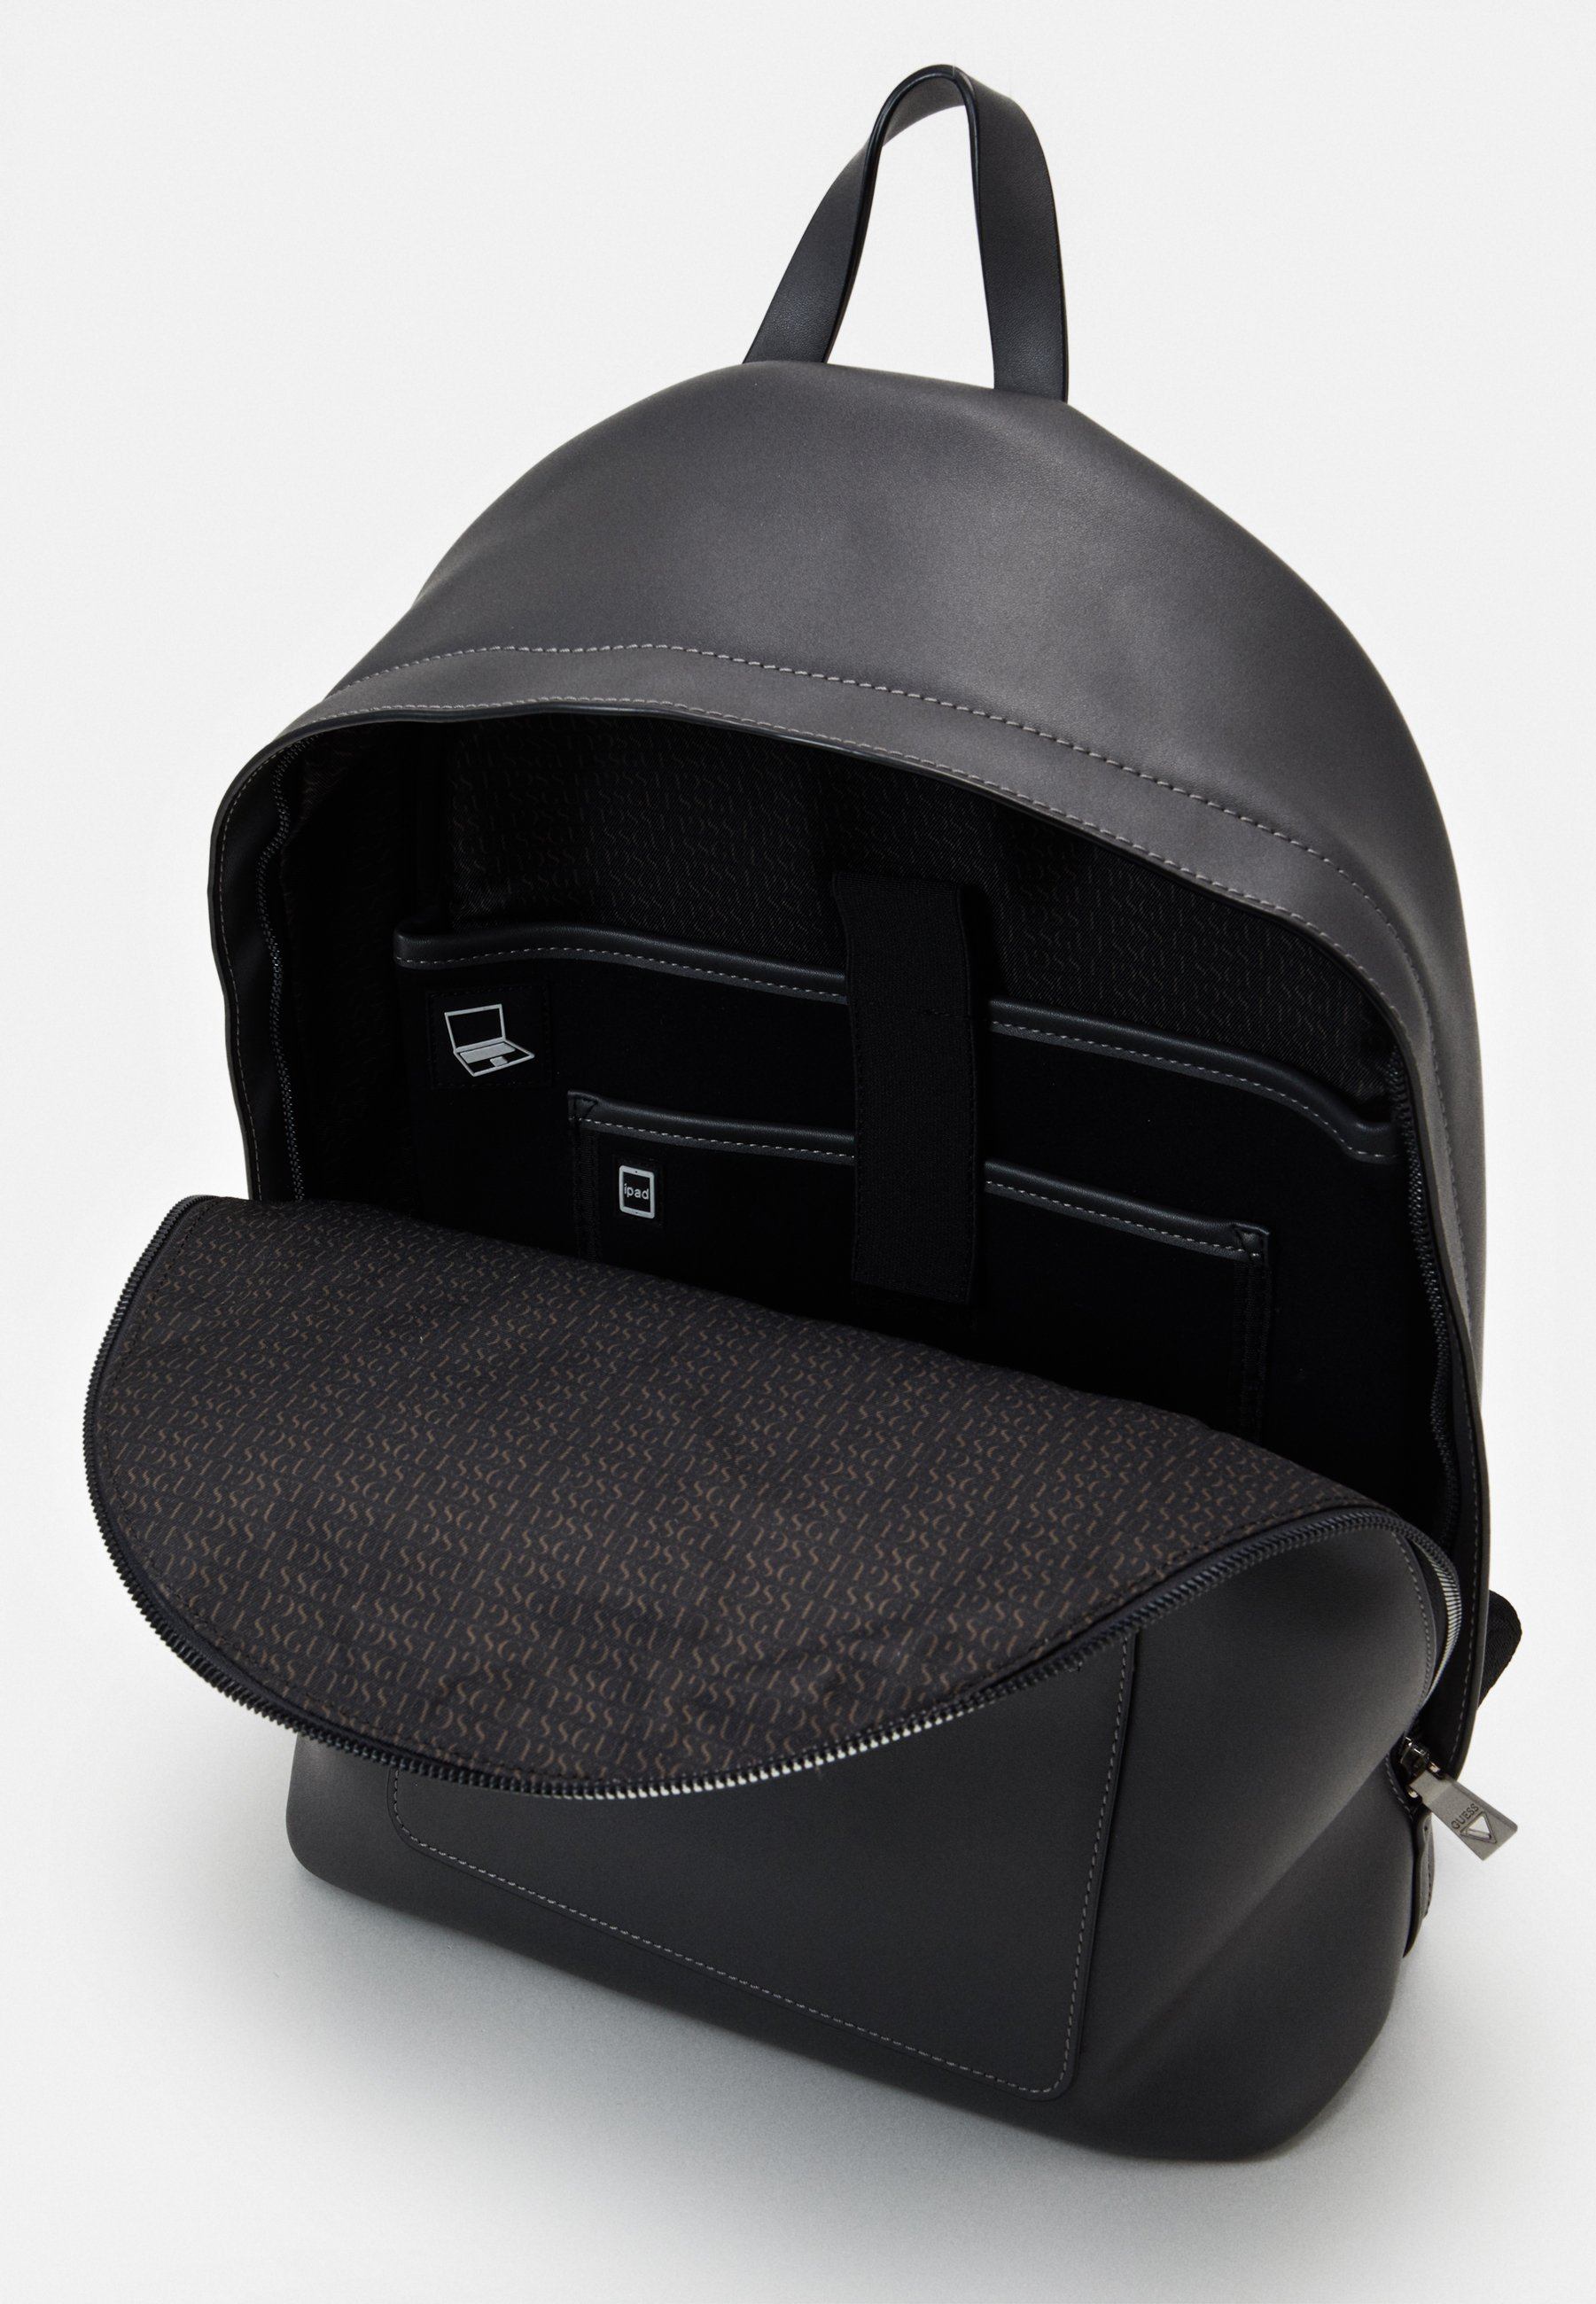 Guess DAN BACKPACK - Tagesrucksack - grey/grau - Herrentaschen O8Ihl